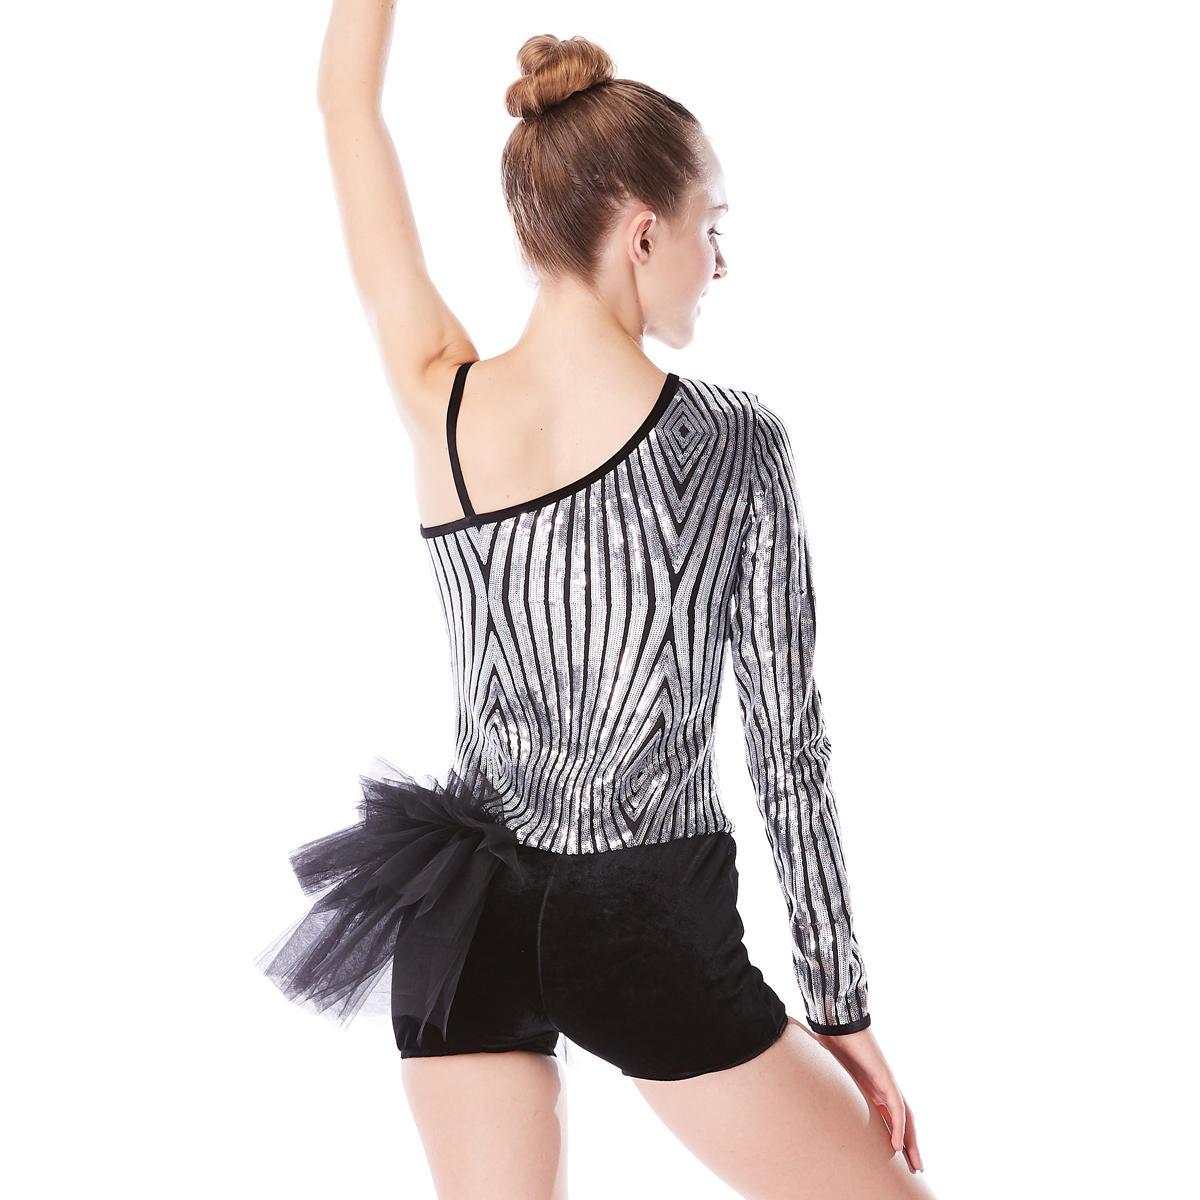 MiDee Sliver and Black Line Girls Ballet Dance Costumes